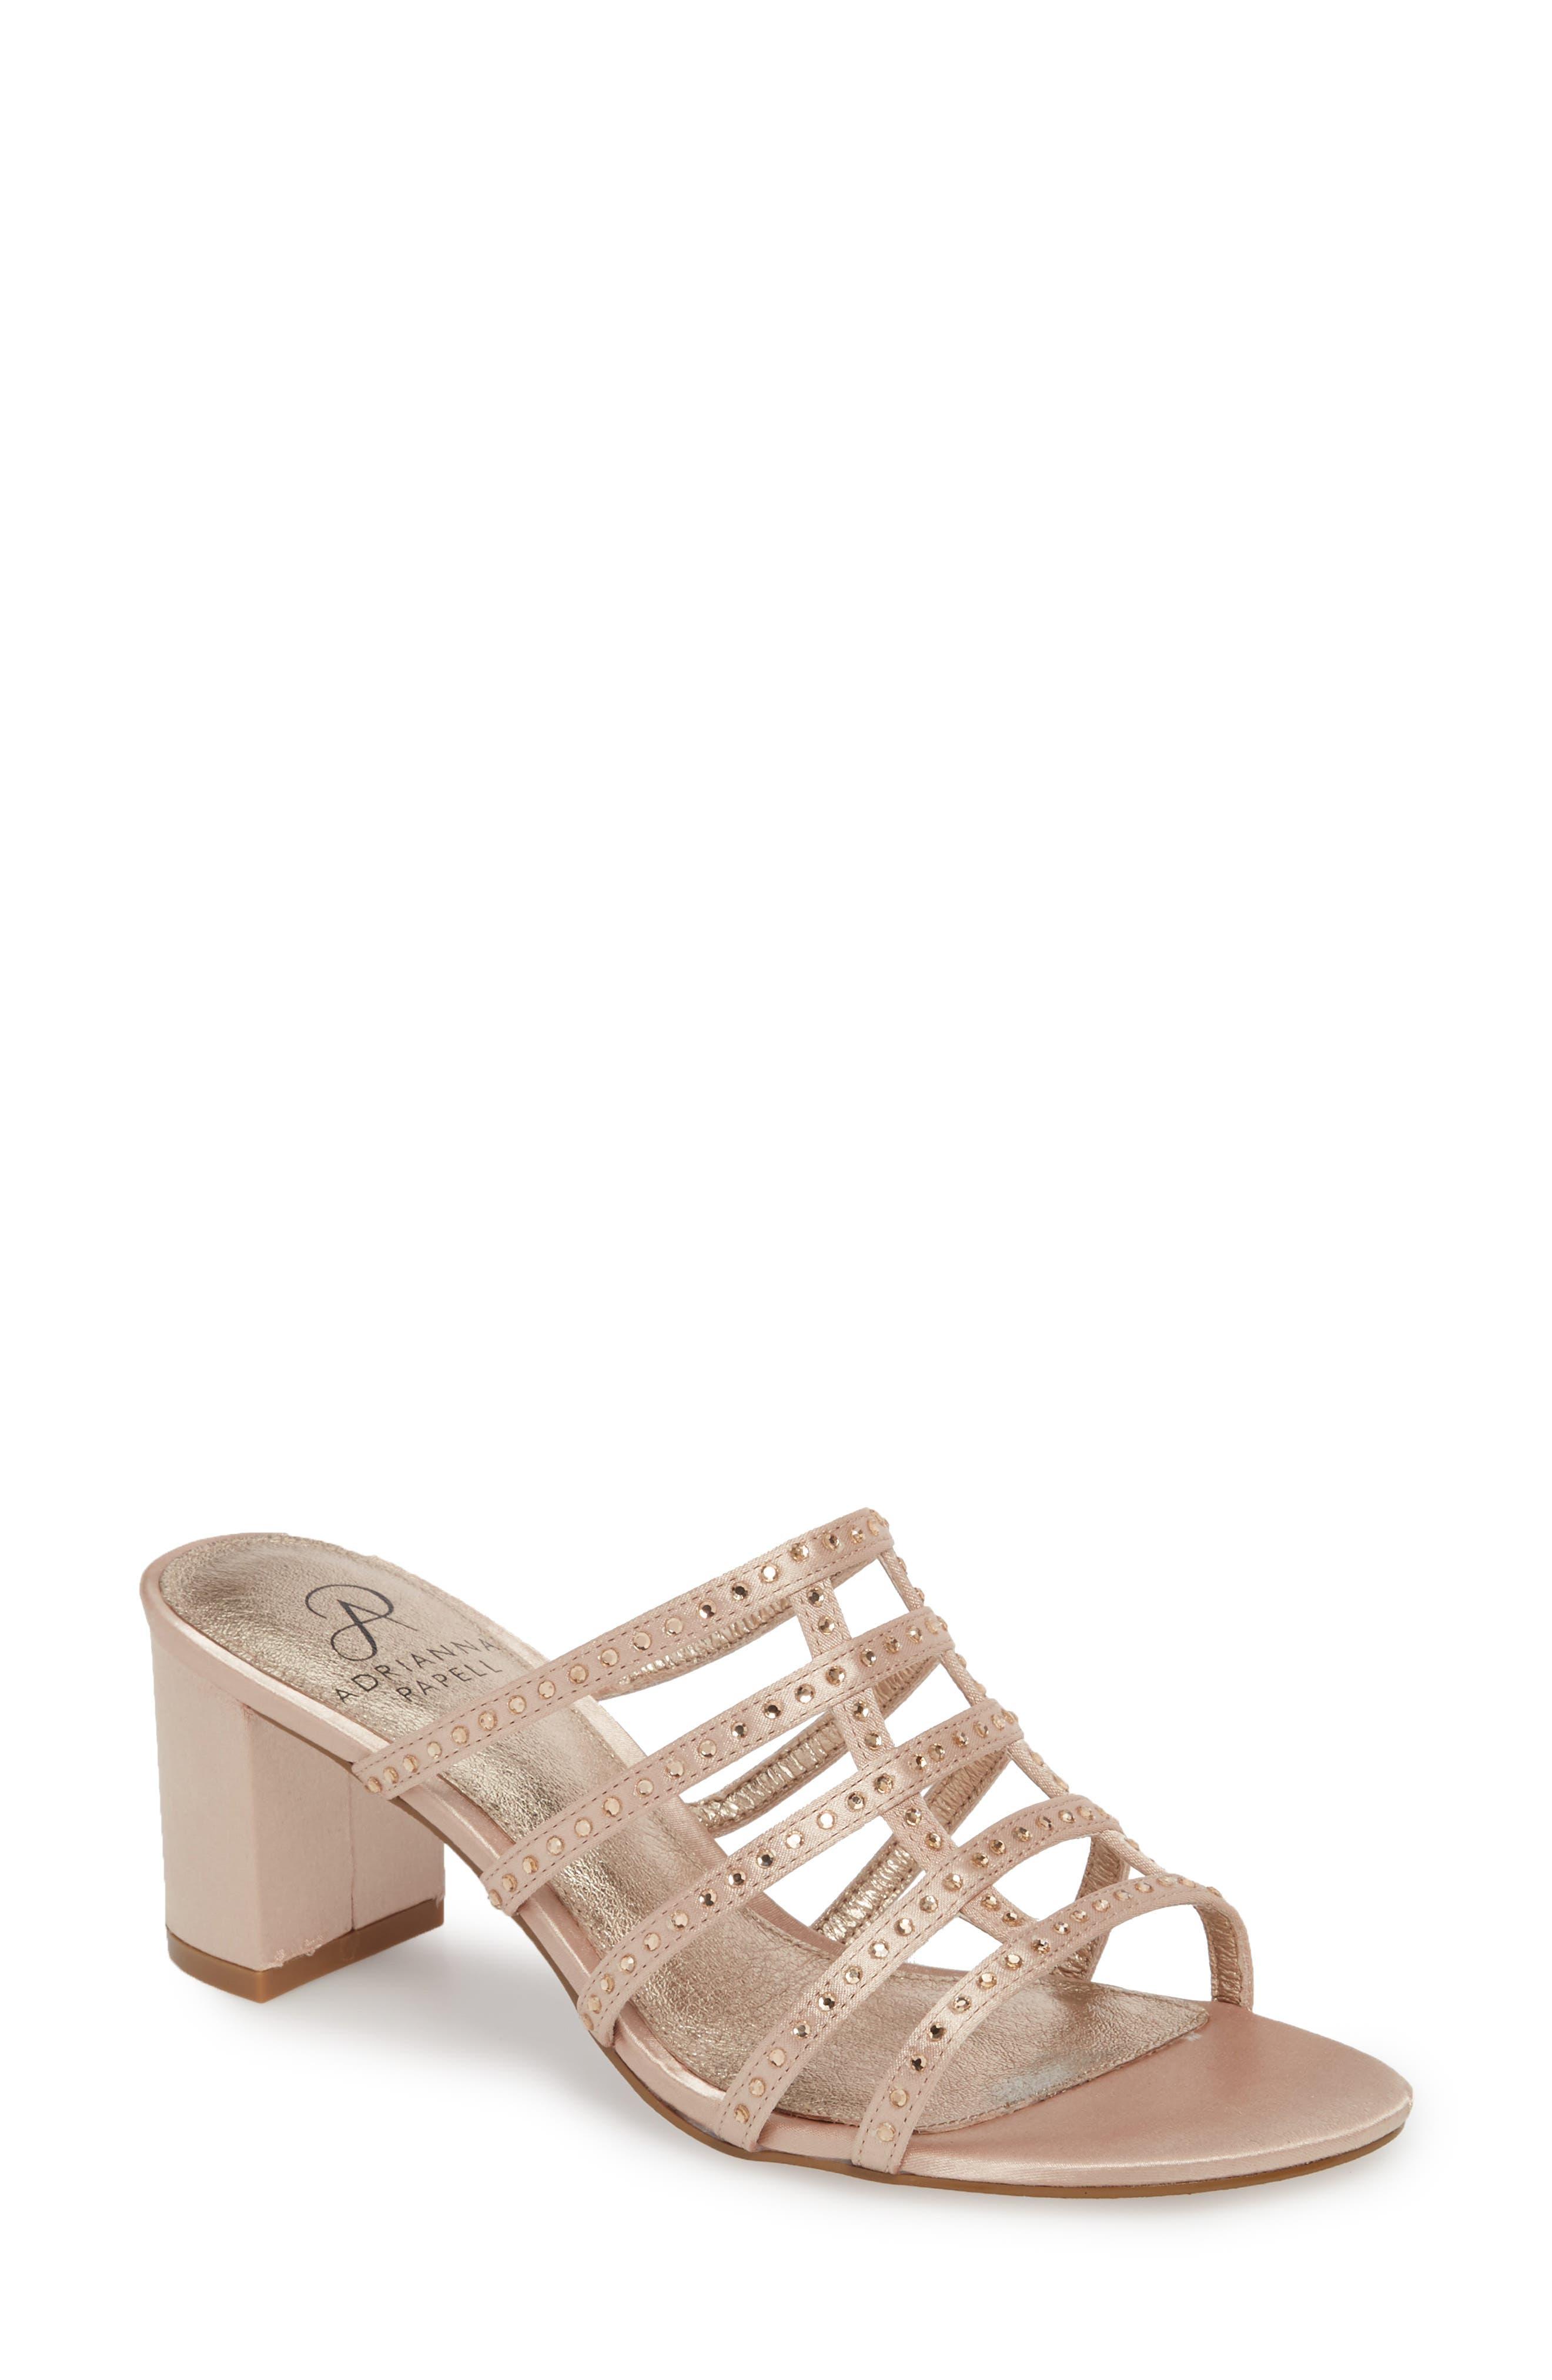 Apollo Block Heel Sandal,                         Main,                         color, Sheer Fabric